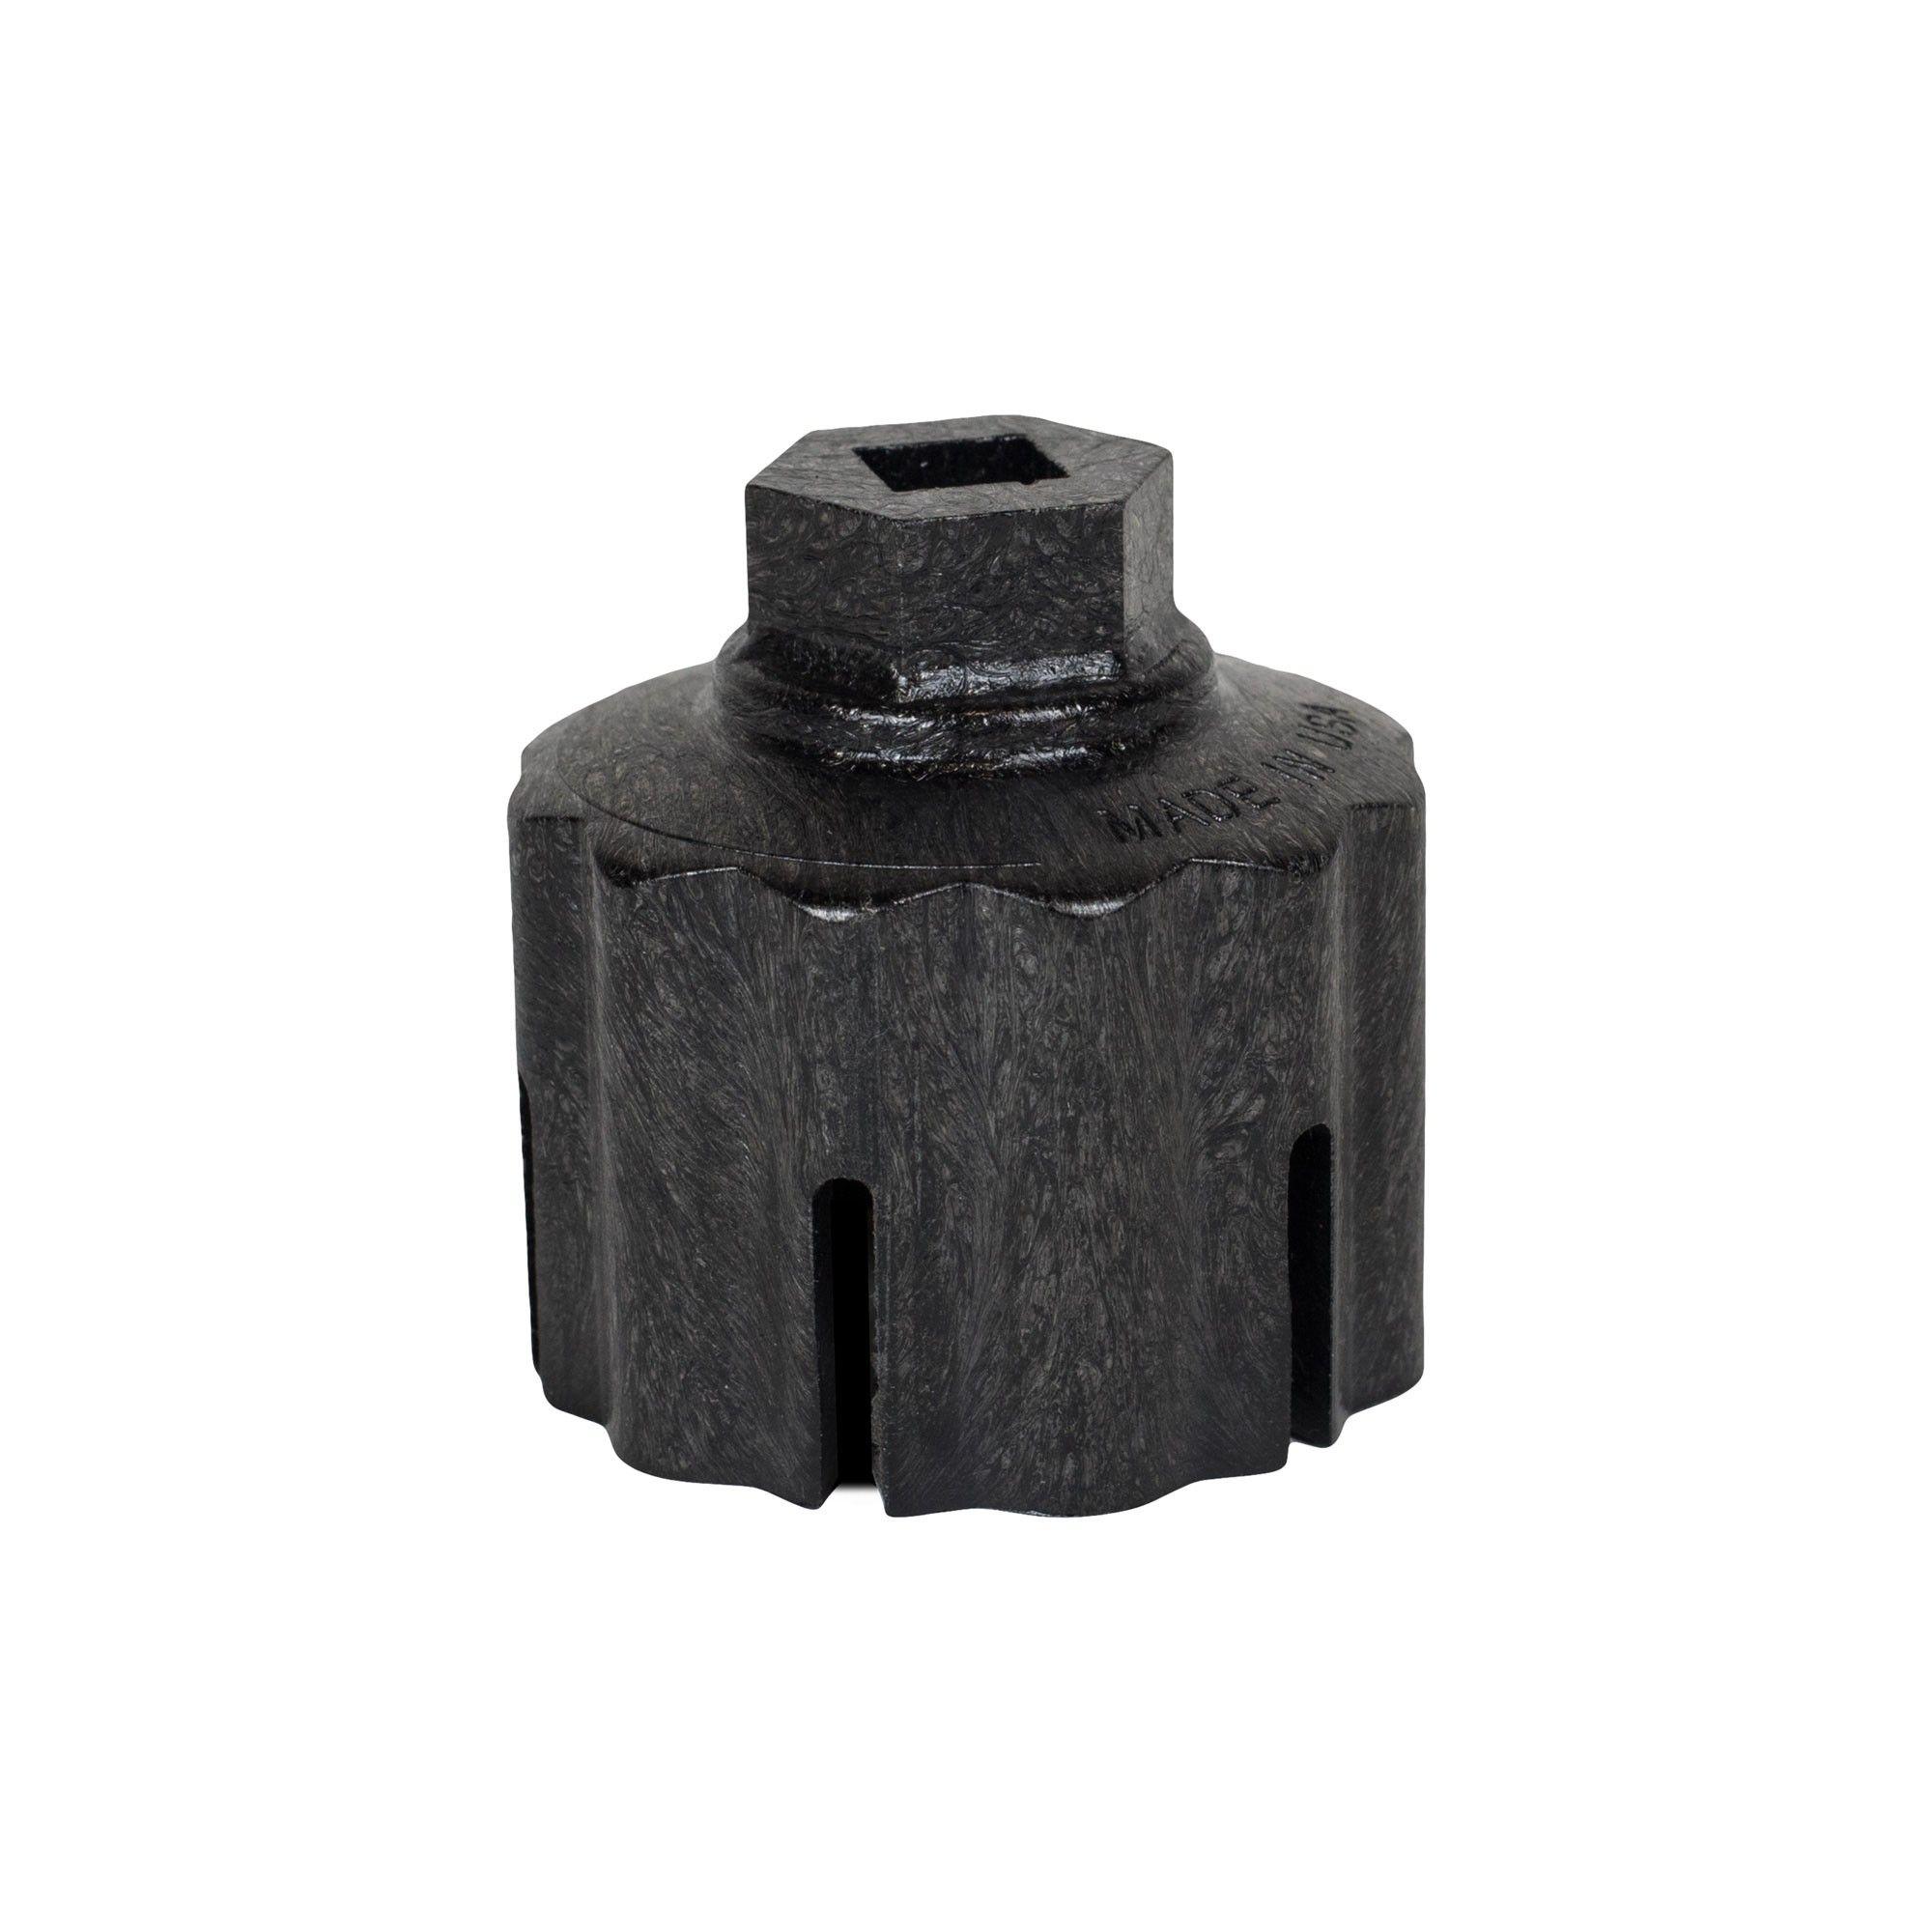 Sloan ST100500 Flushmate Cartridge Wrench